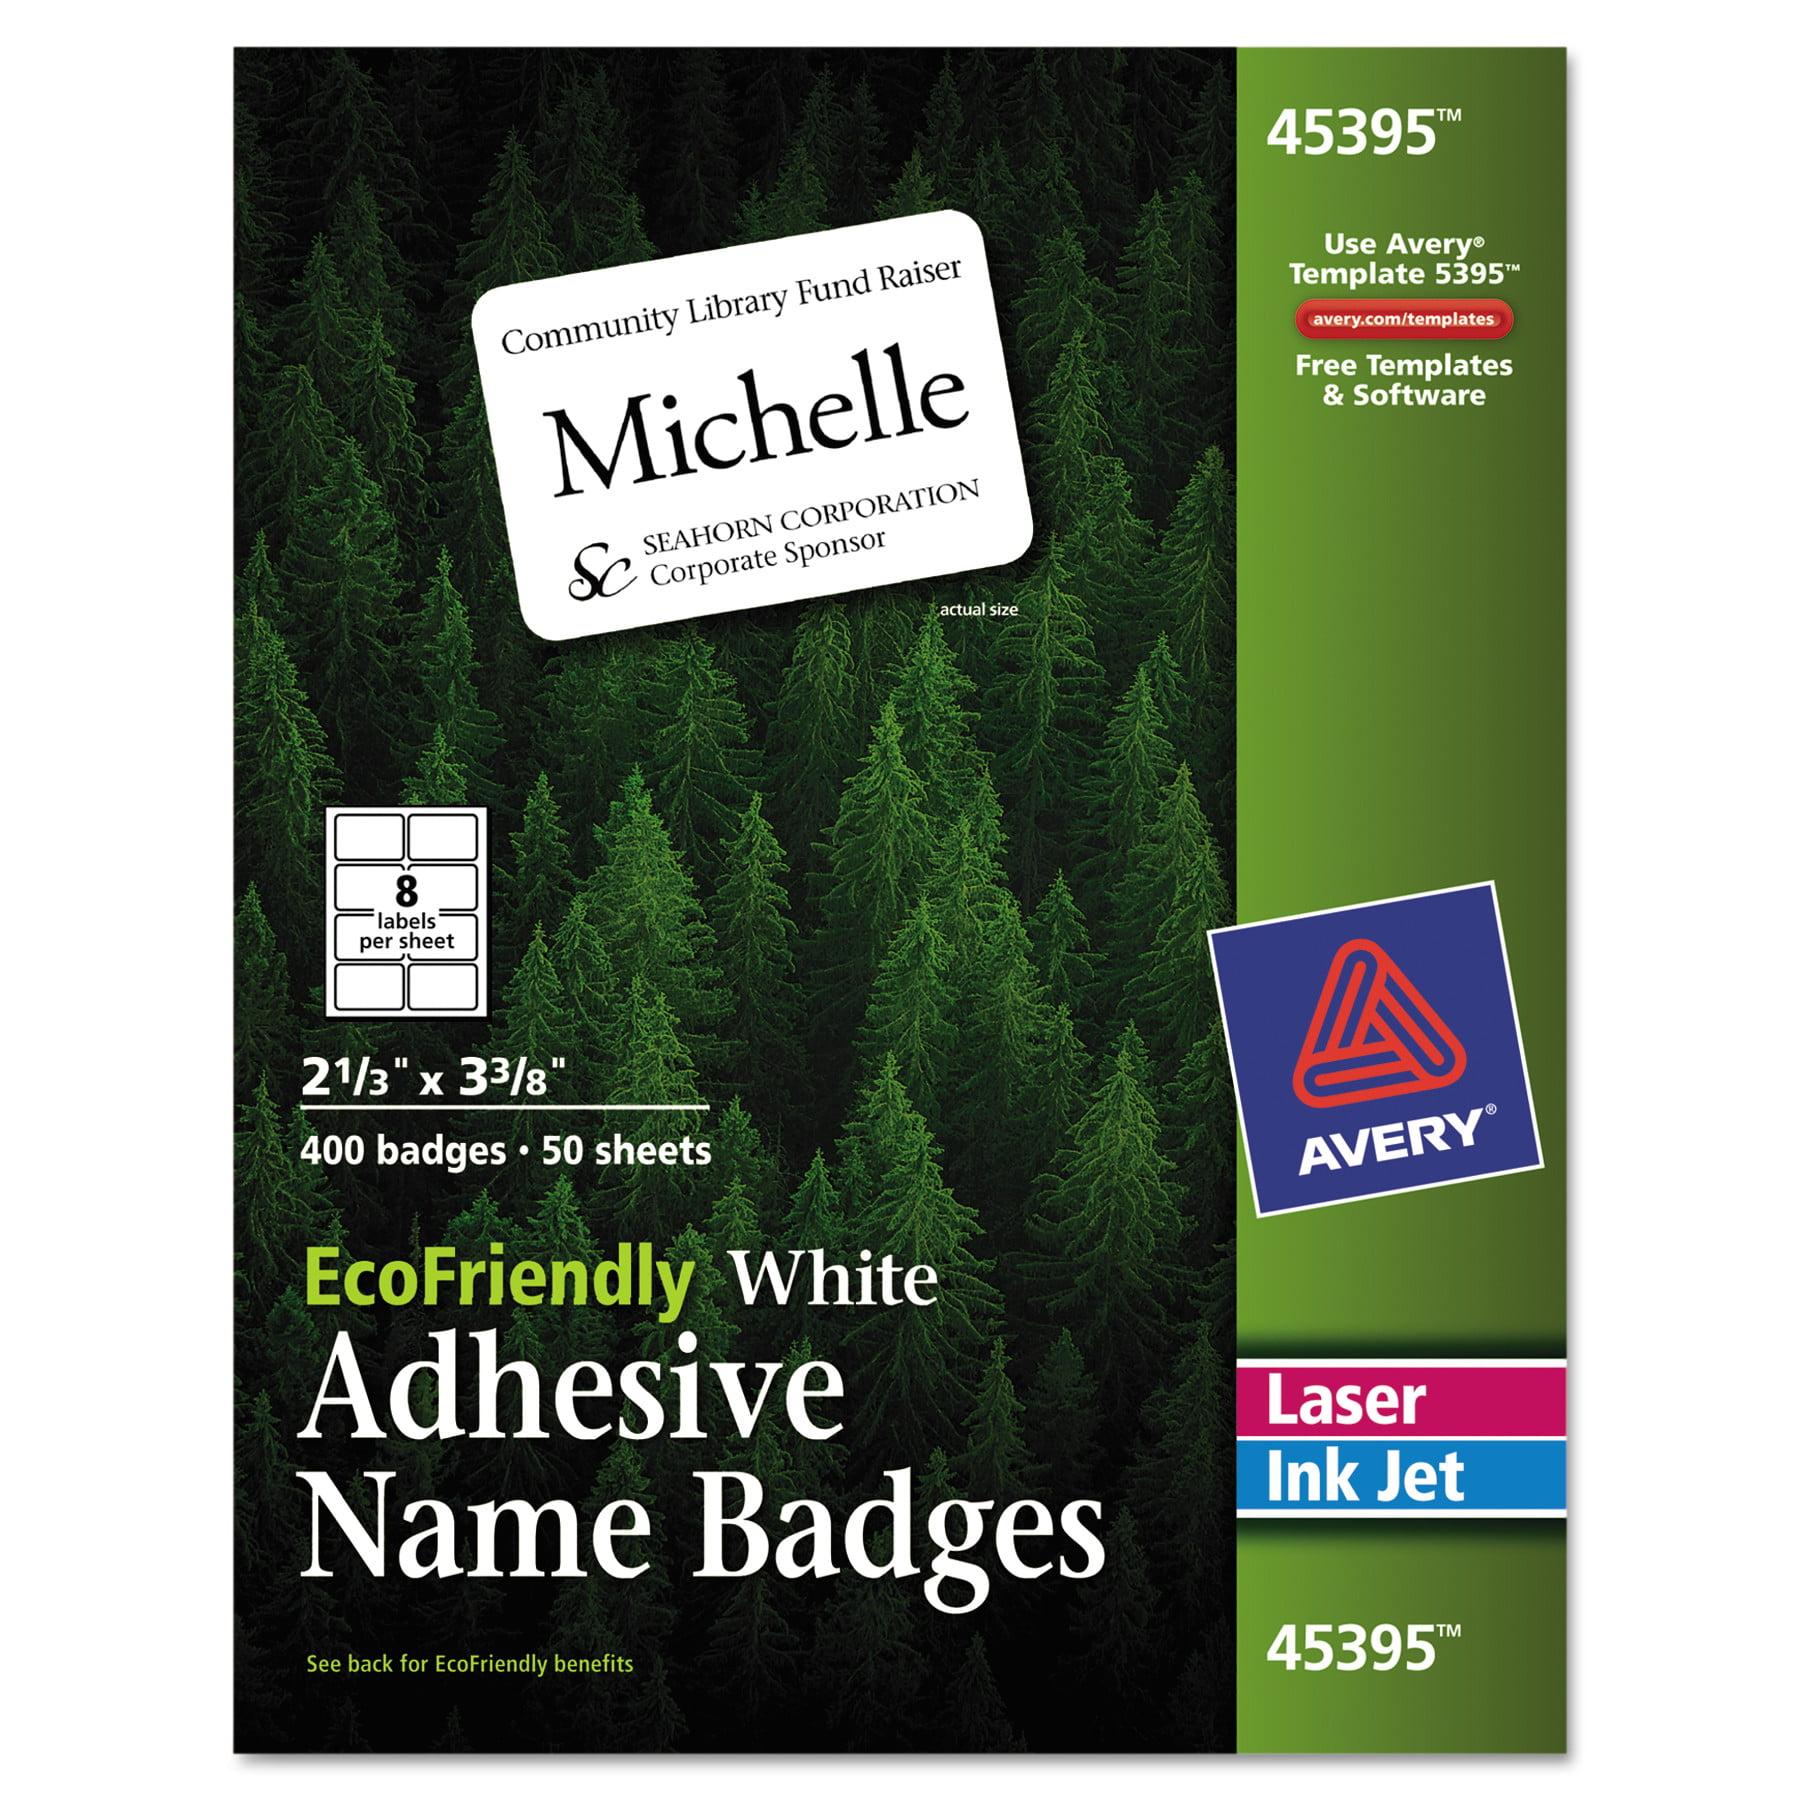 Avery EcoFriendly Adhesive Name Badge Labels, 2 1/3 x 3 3/8, White, 400/Box